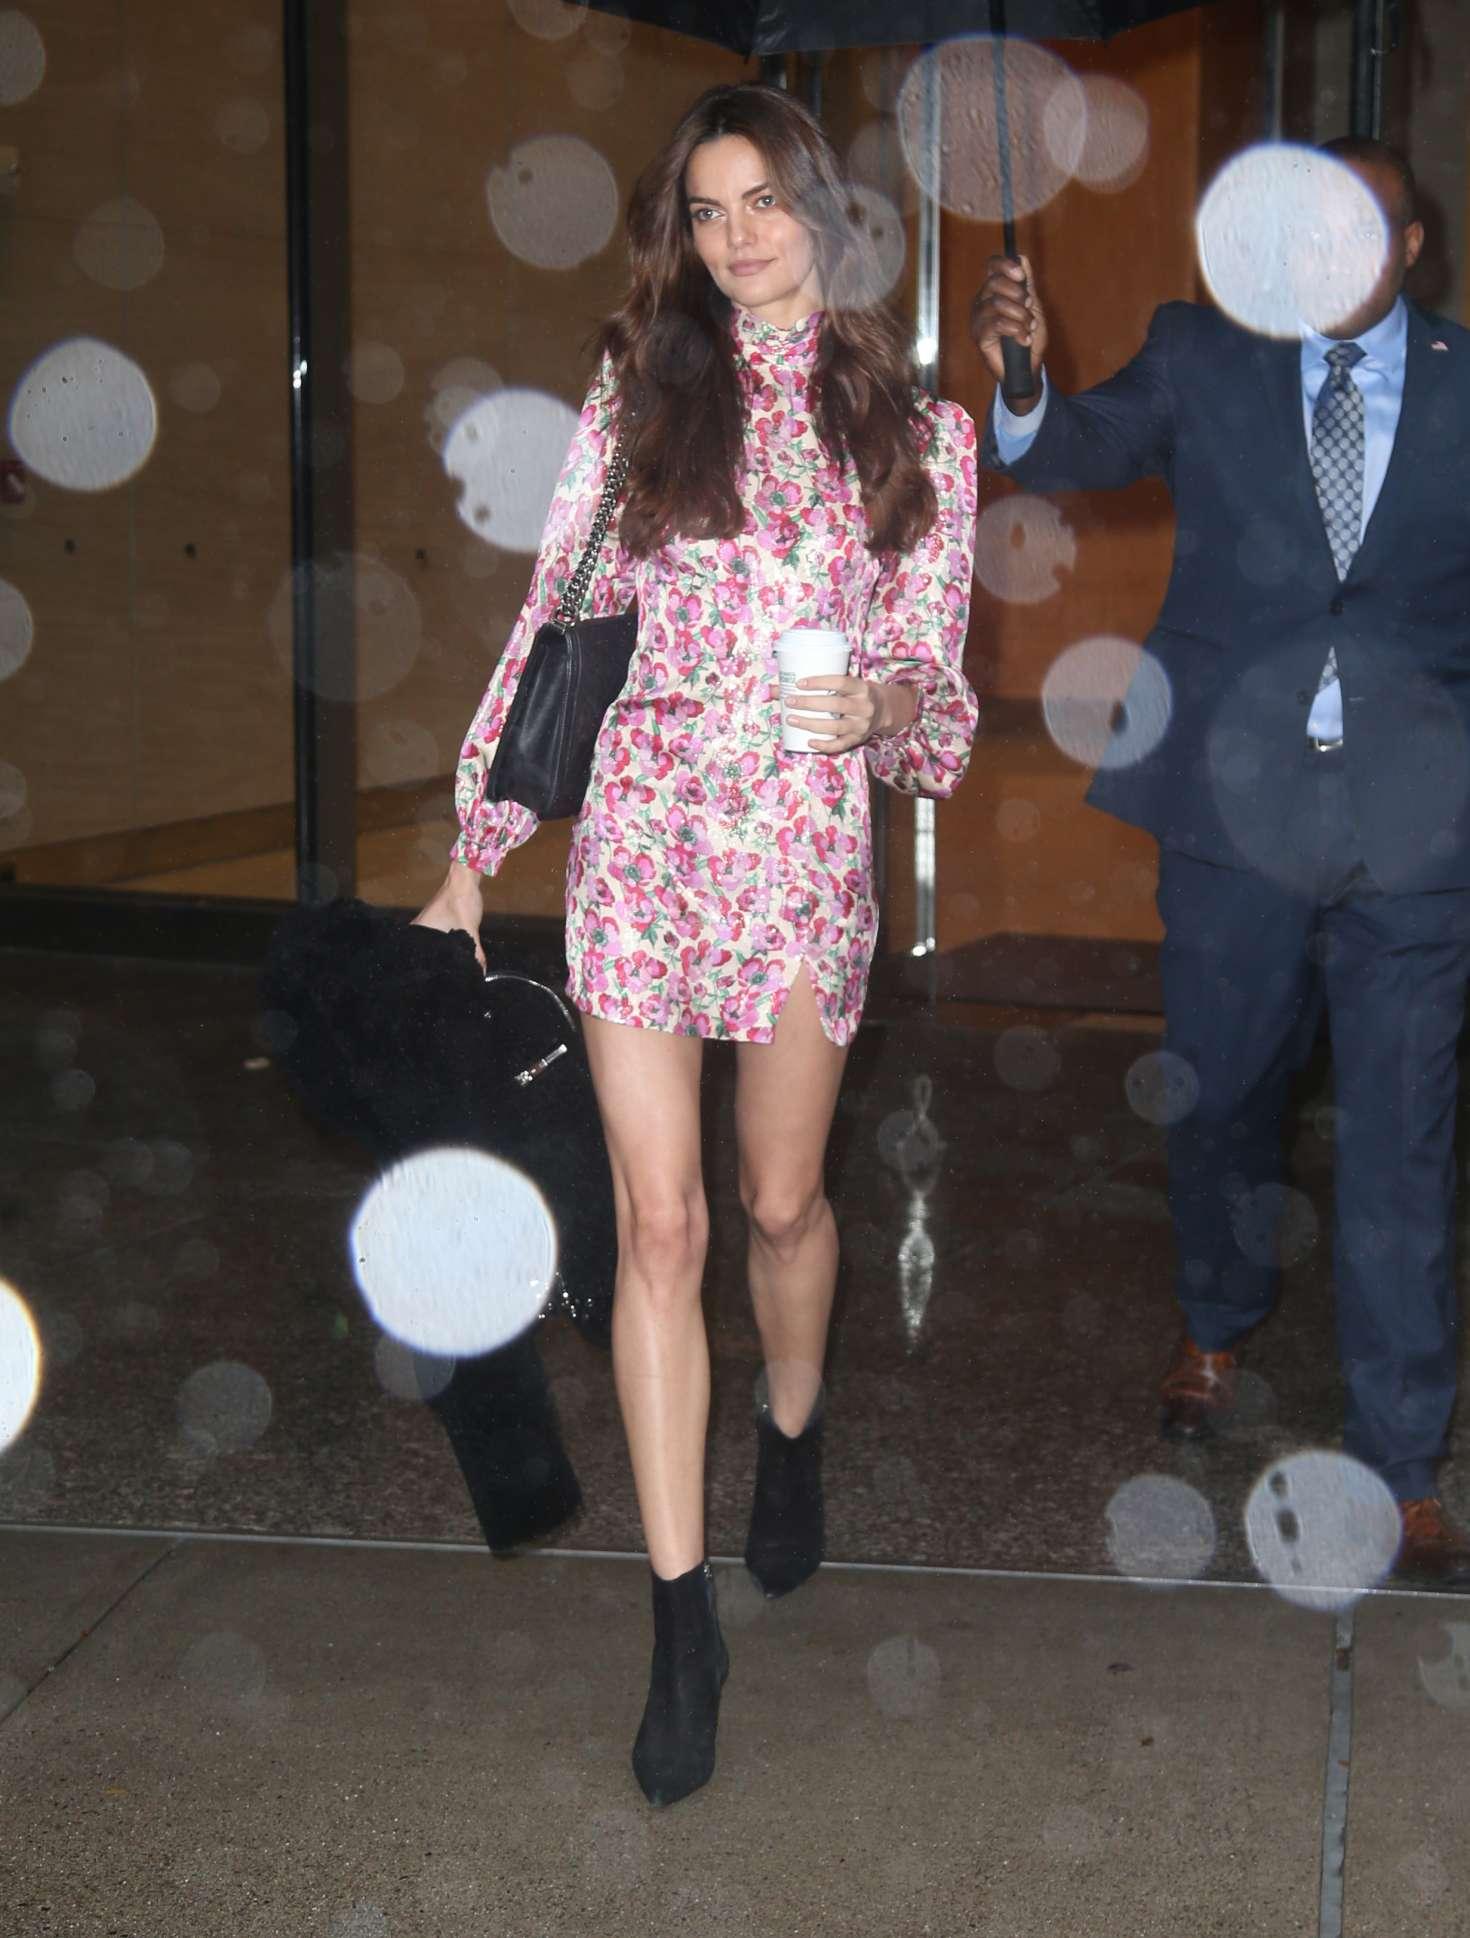 Barbara Fialho 2018 : Barbara Fialho: Victorias Secret Fittings in New York -04